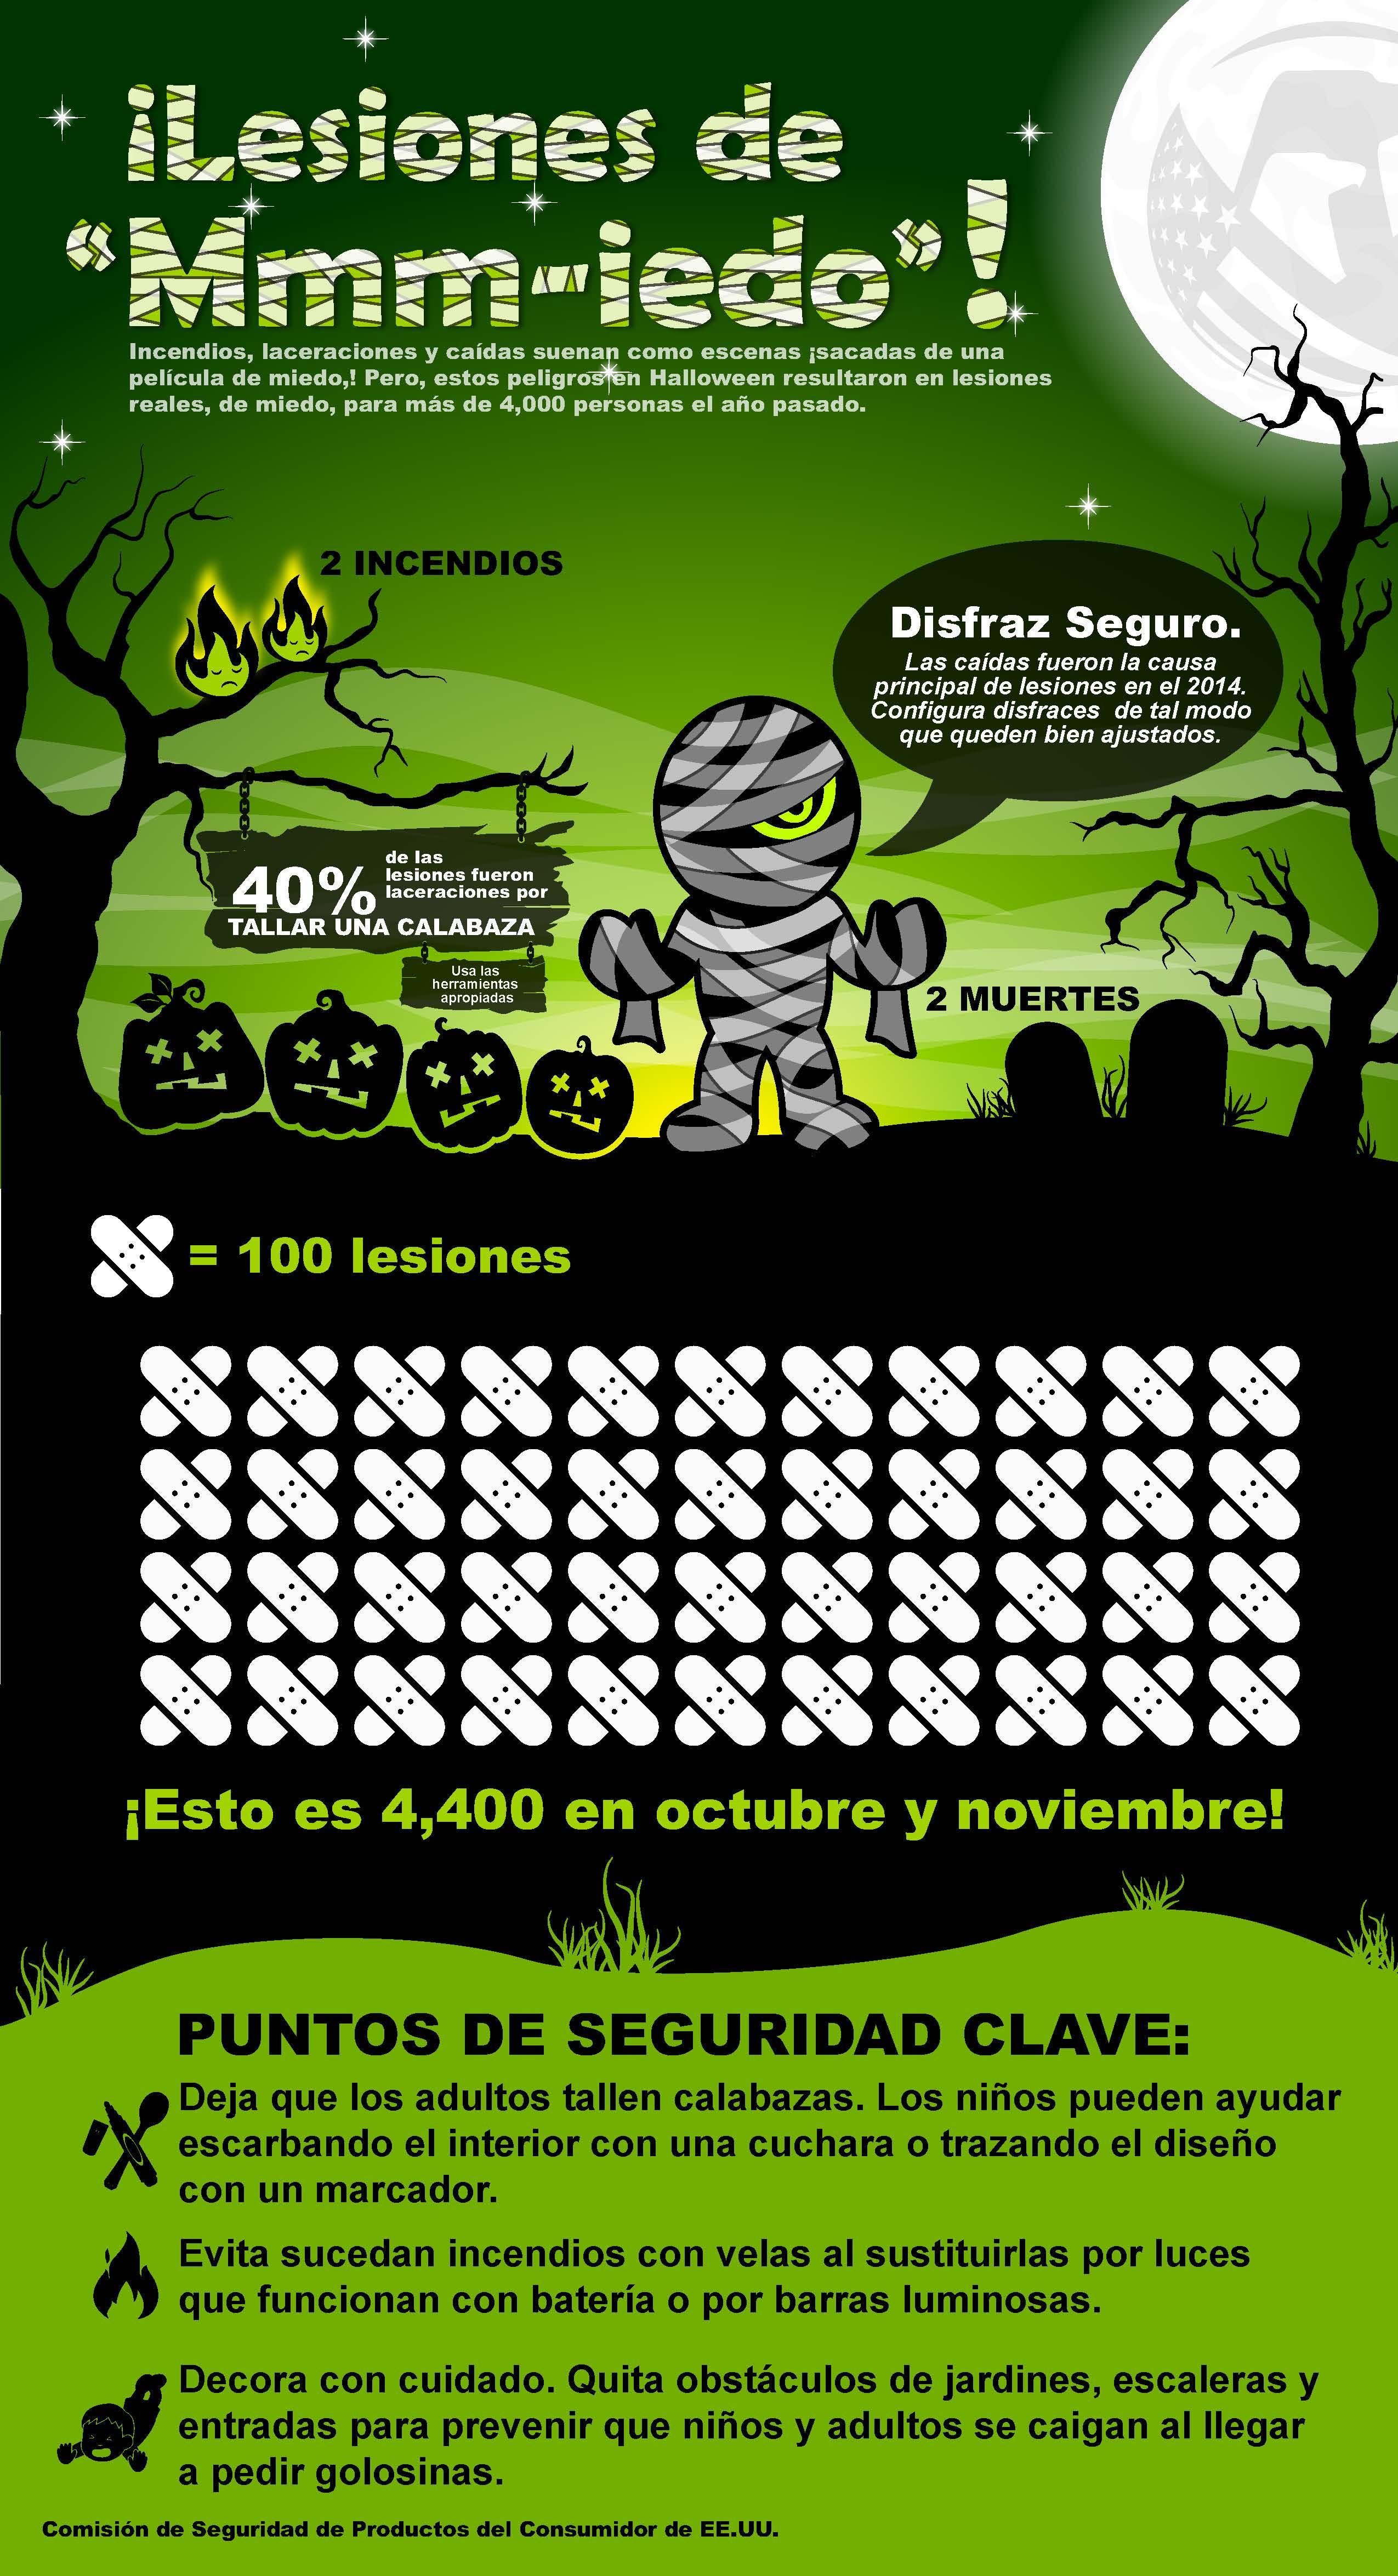 Infografía sobre lesiones vinculadas a Halloween